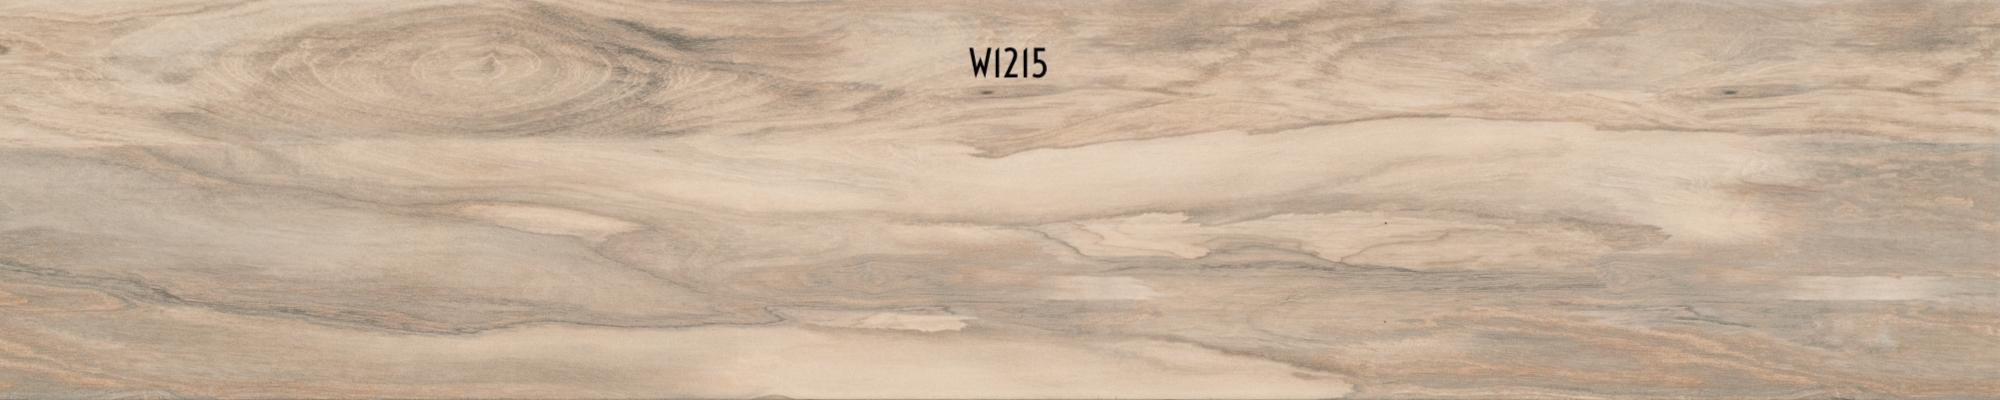 W1215